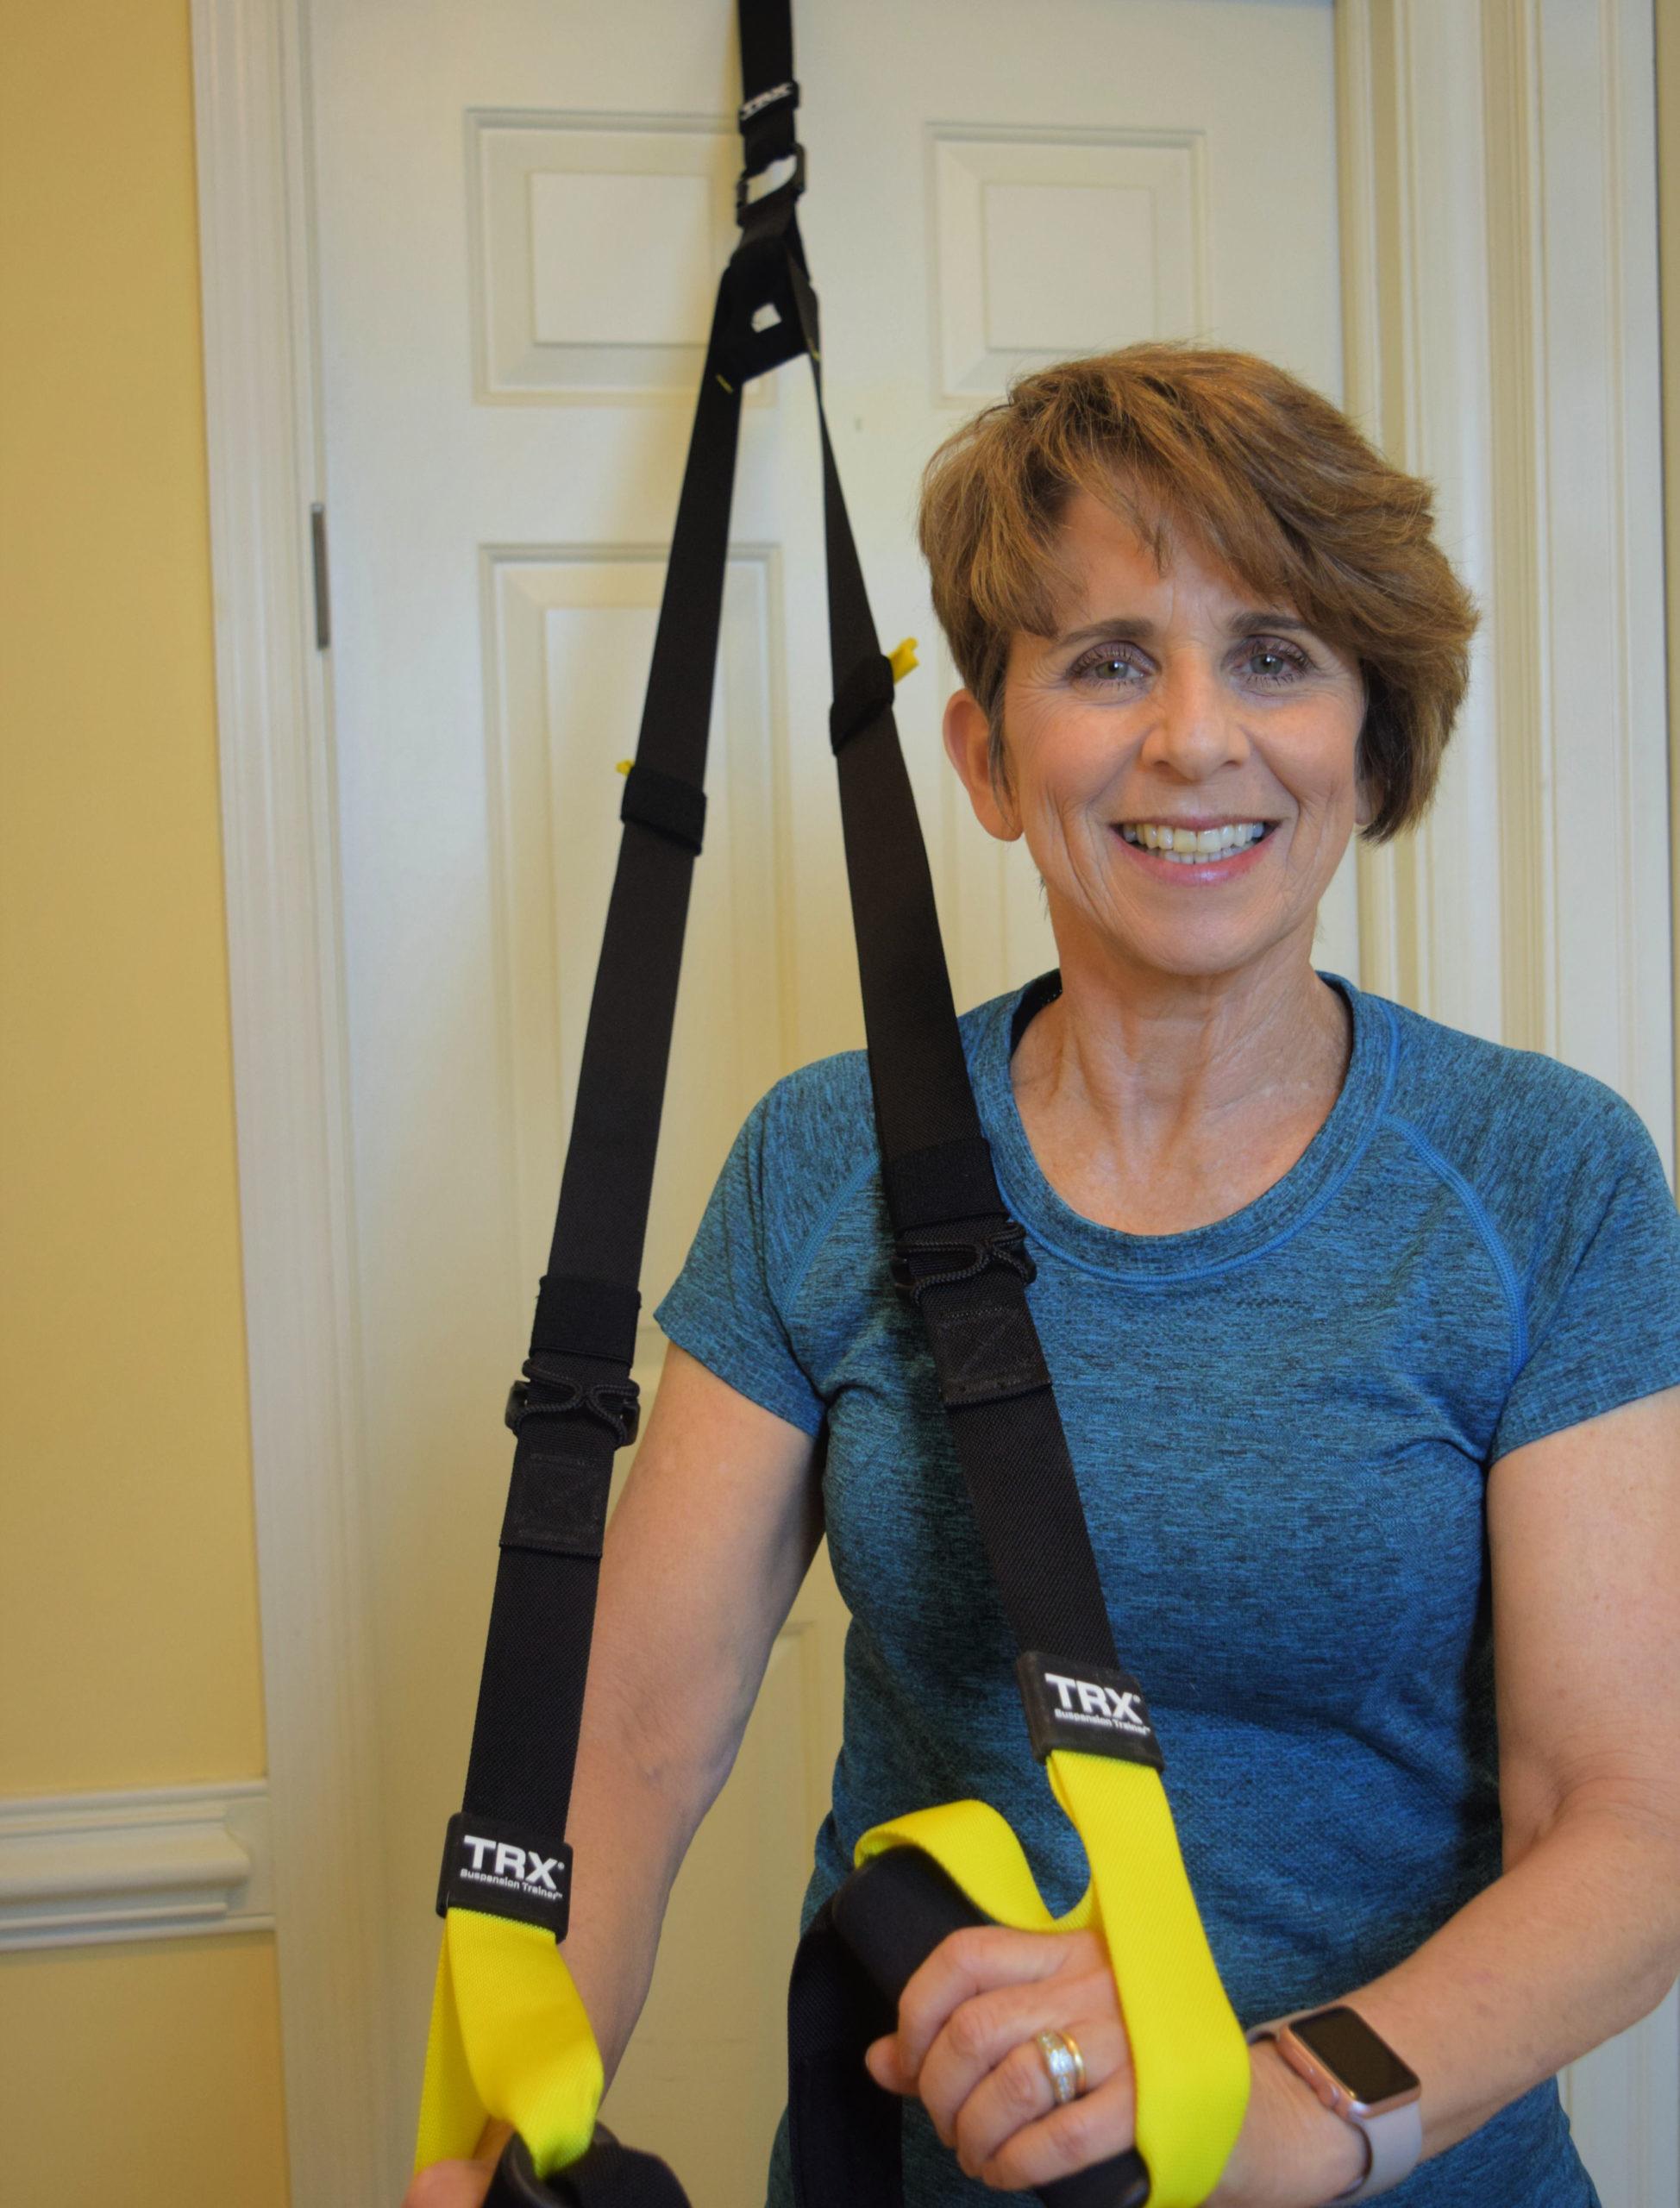 TRX straps for exercise